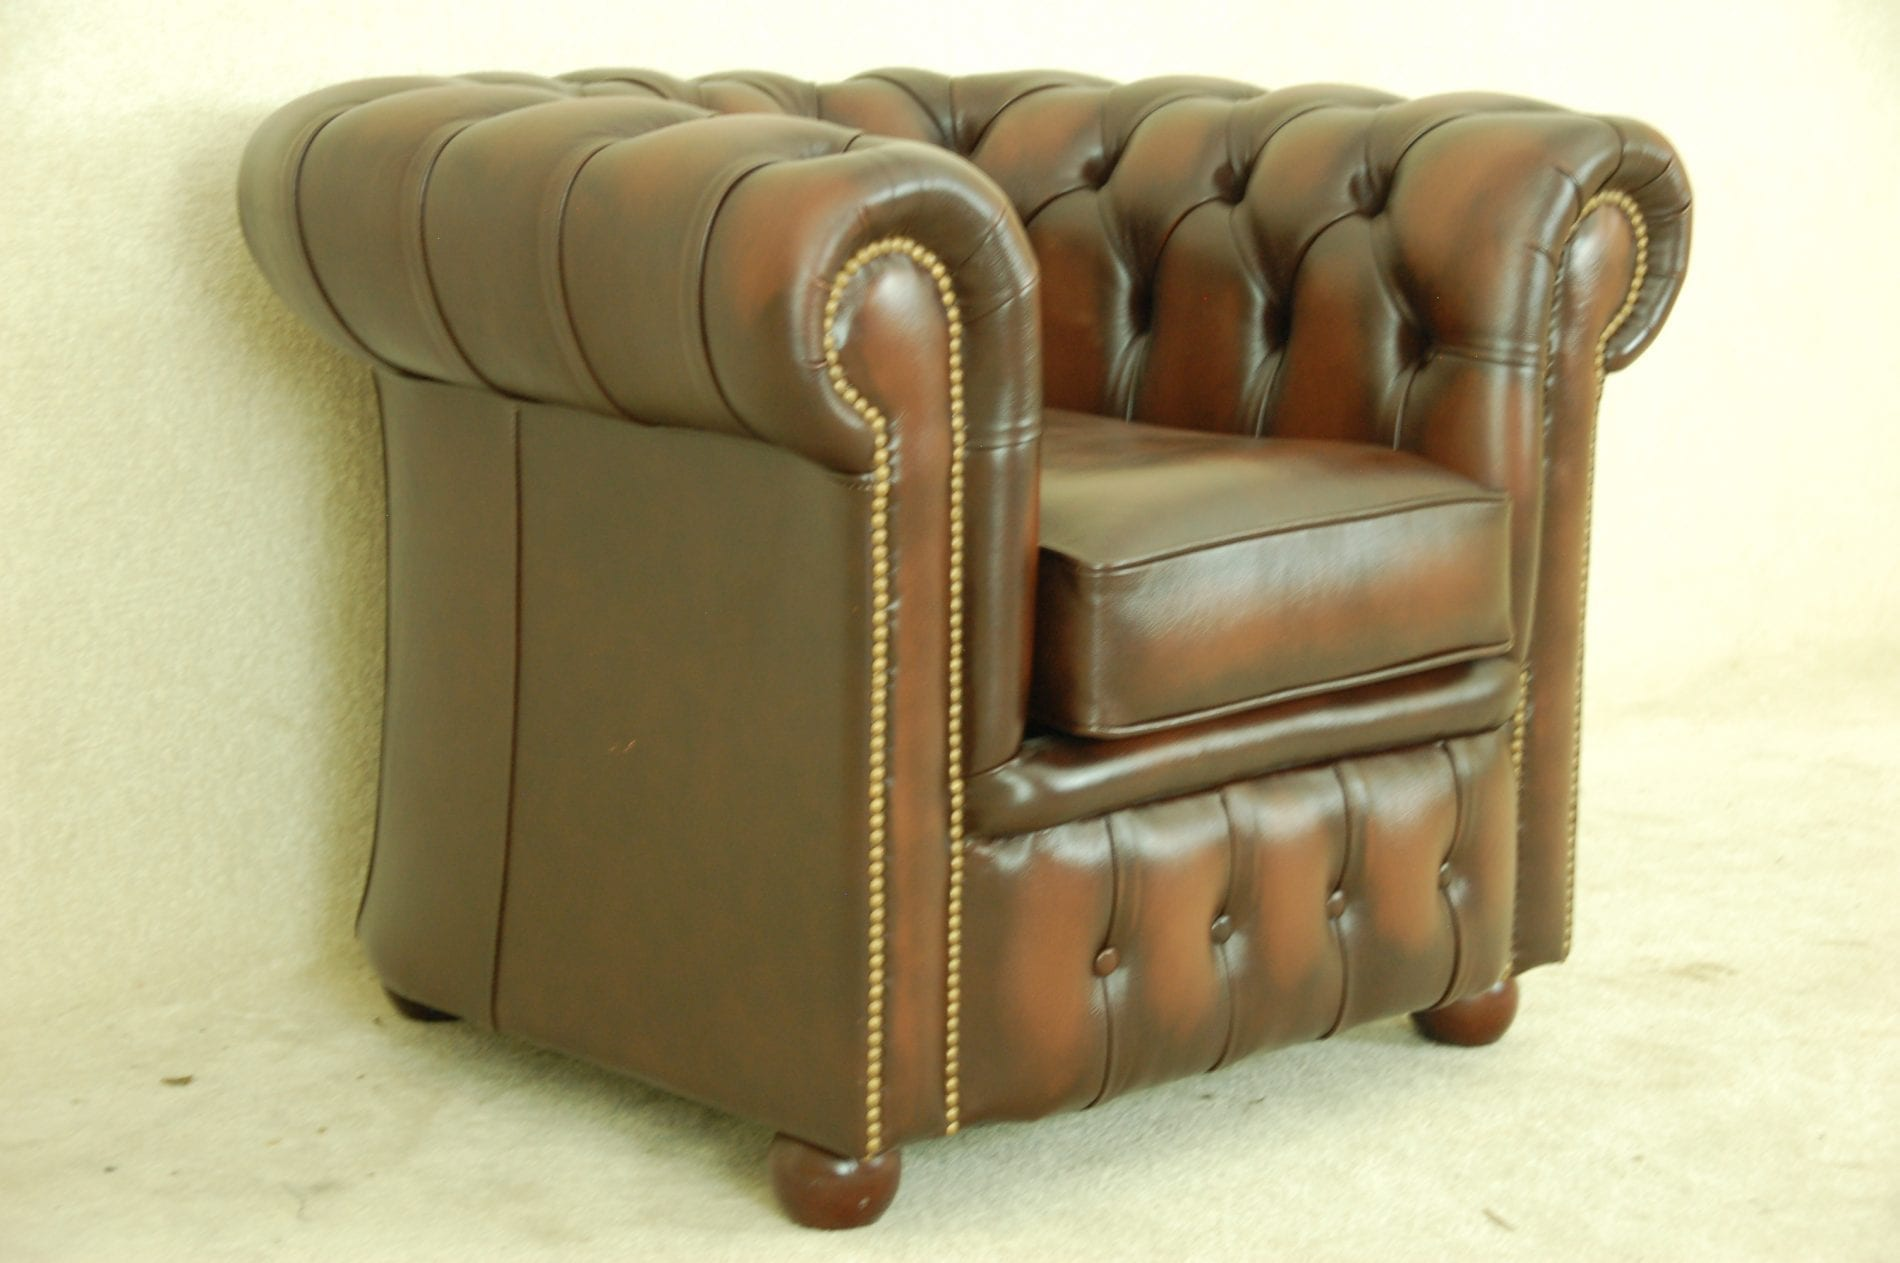 Eton chesterfield fauteuil in het bruin